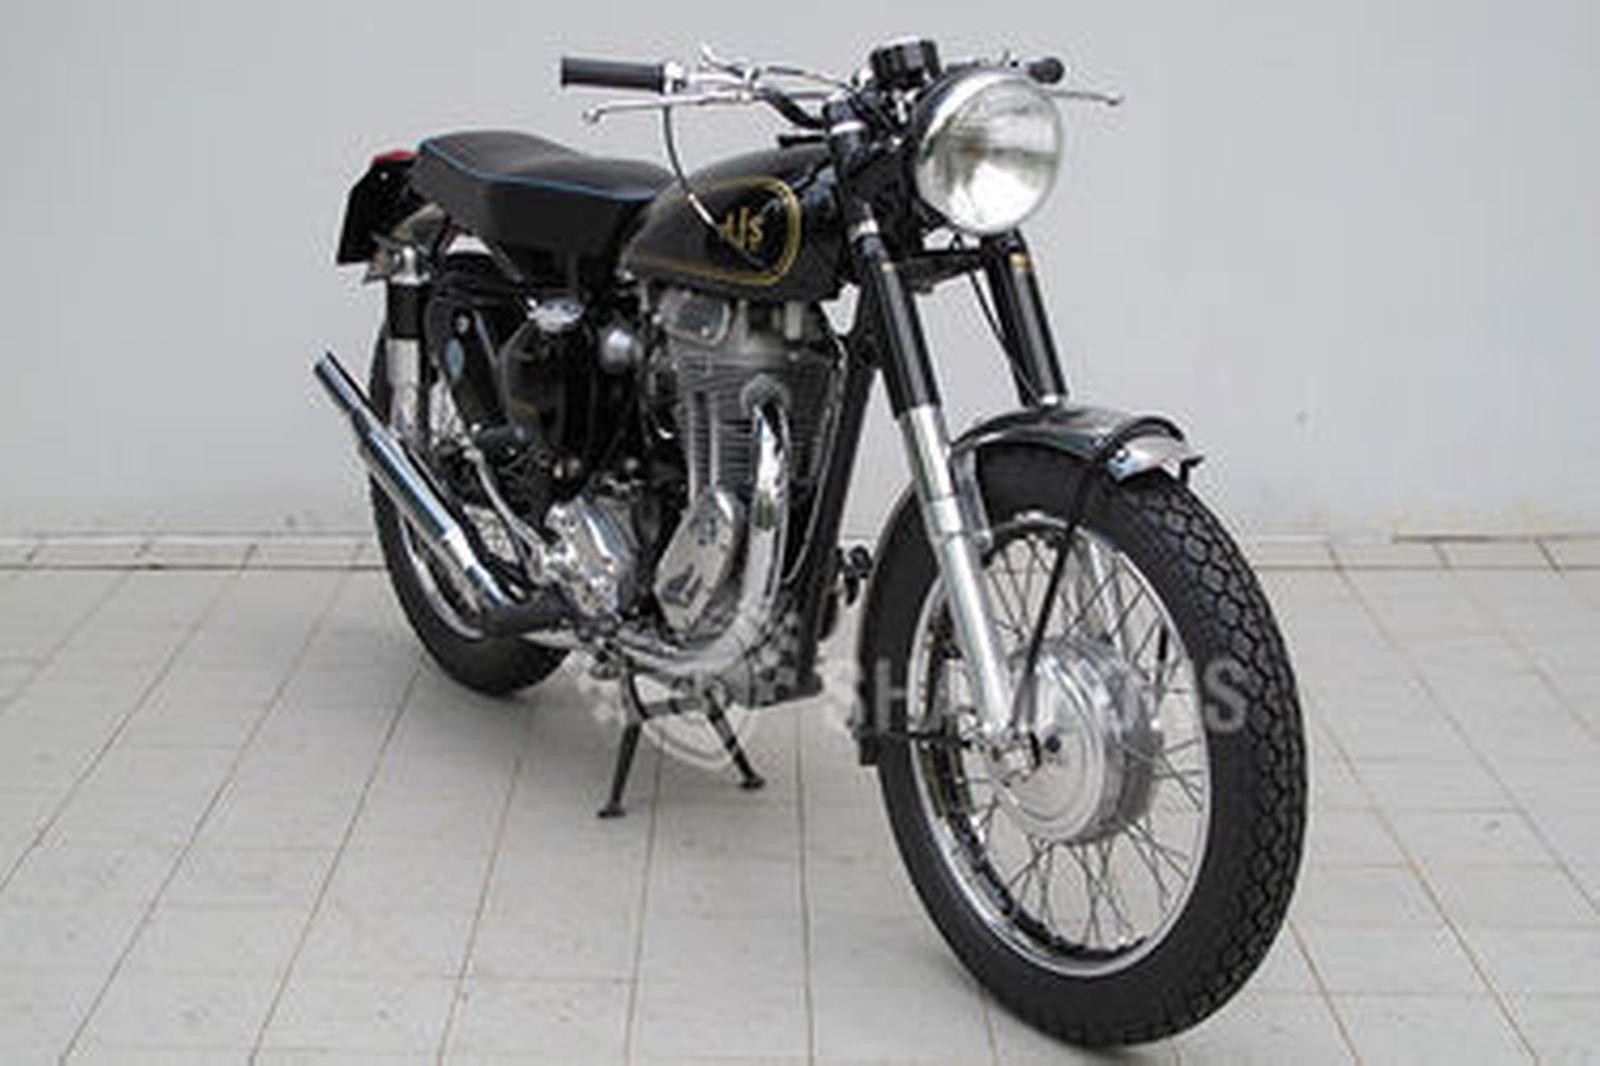 AJS 18S 500cc Motorcycle